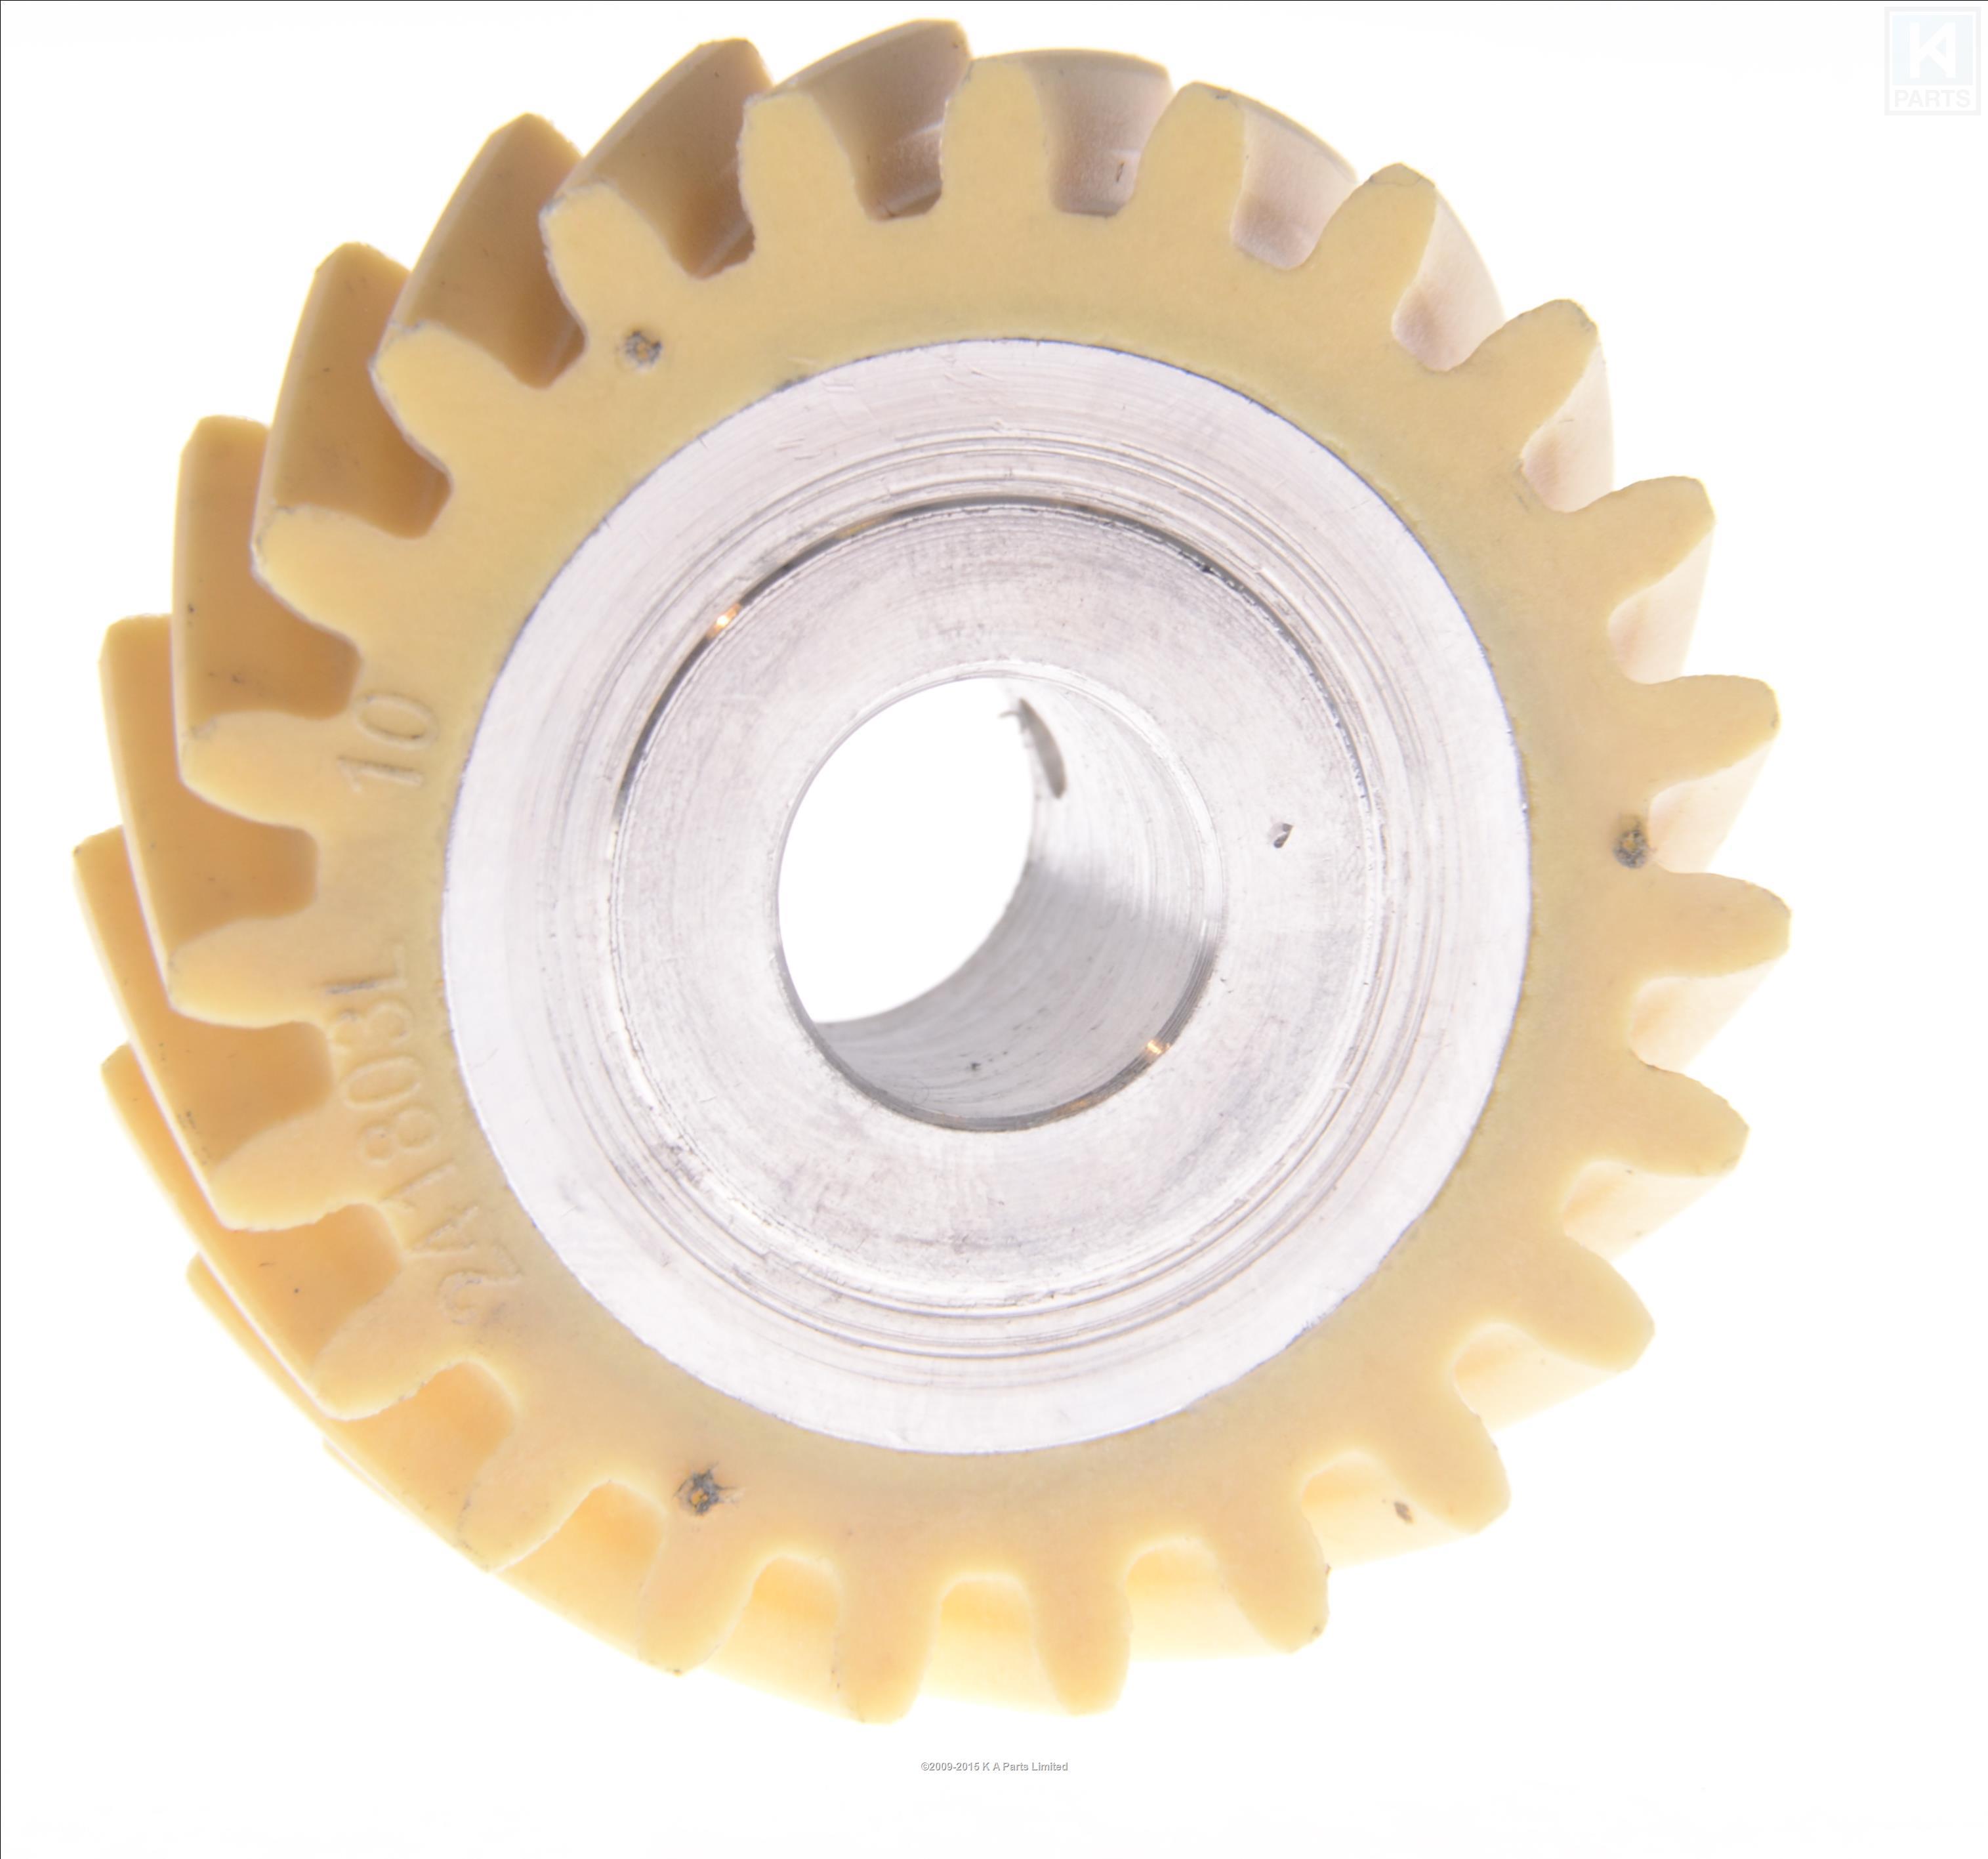 Kitchenaid Blender Parts List Mixer Diagram On Part Worm Gear W10112253 Professional 5 Speed